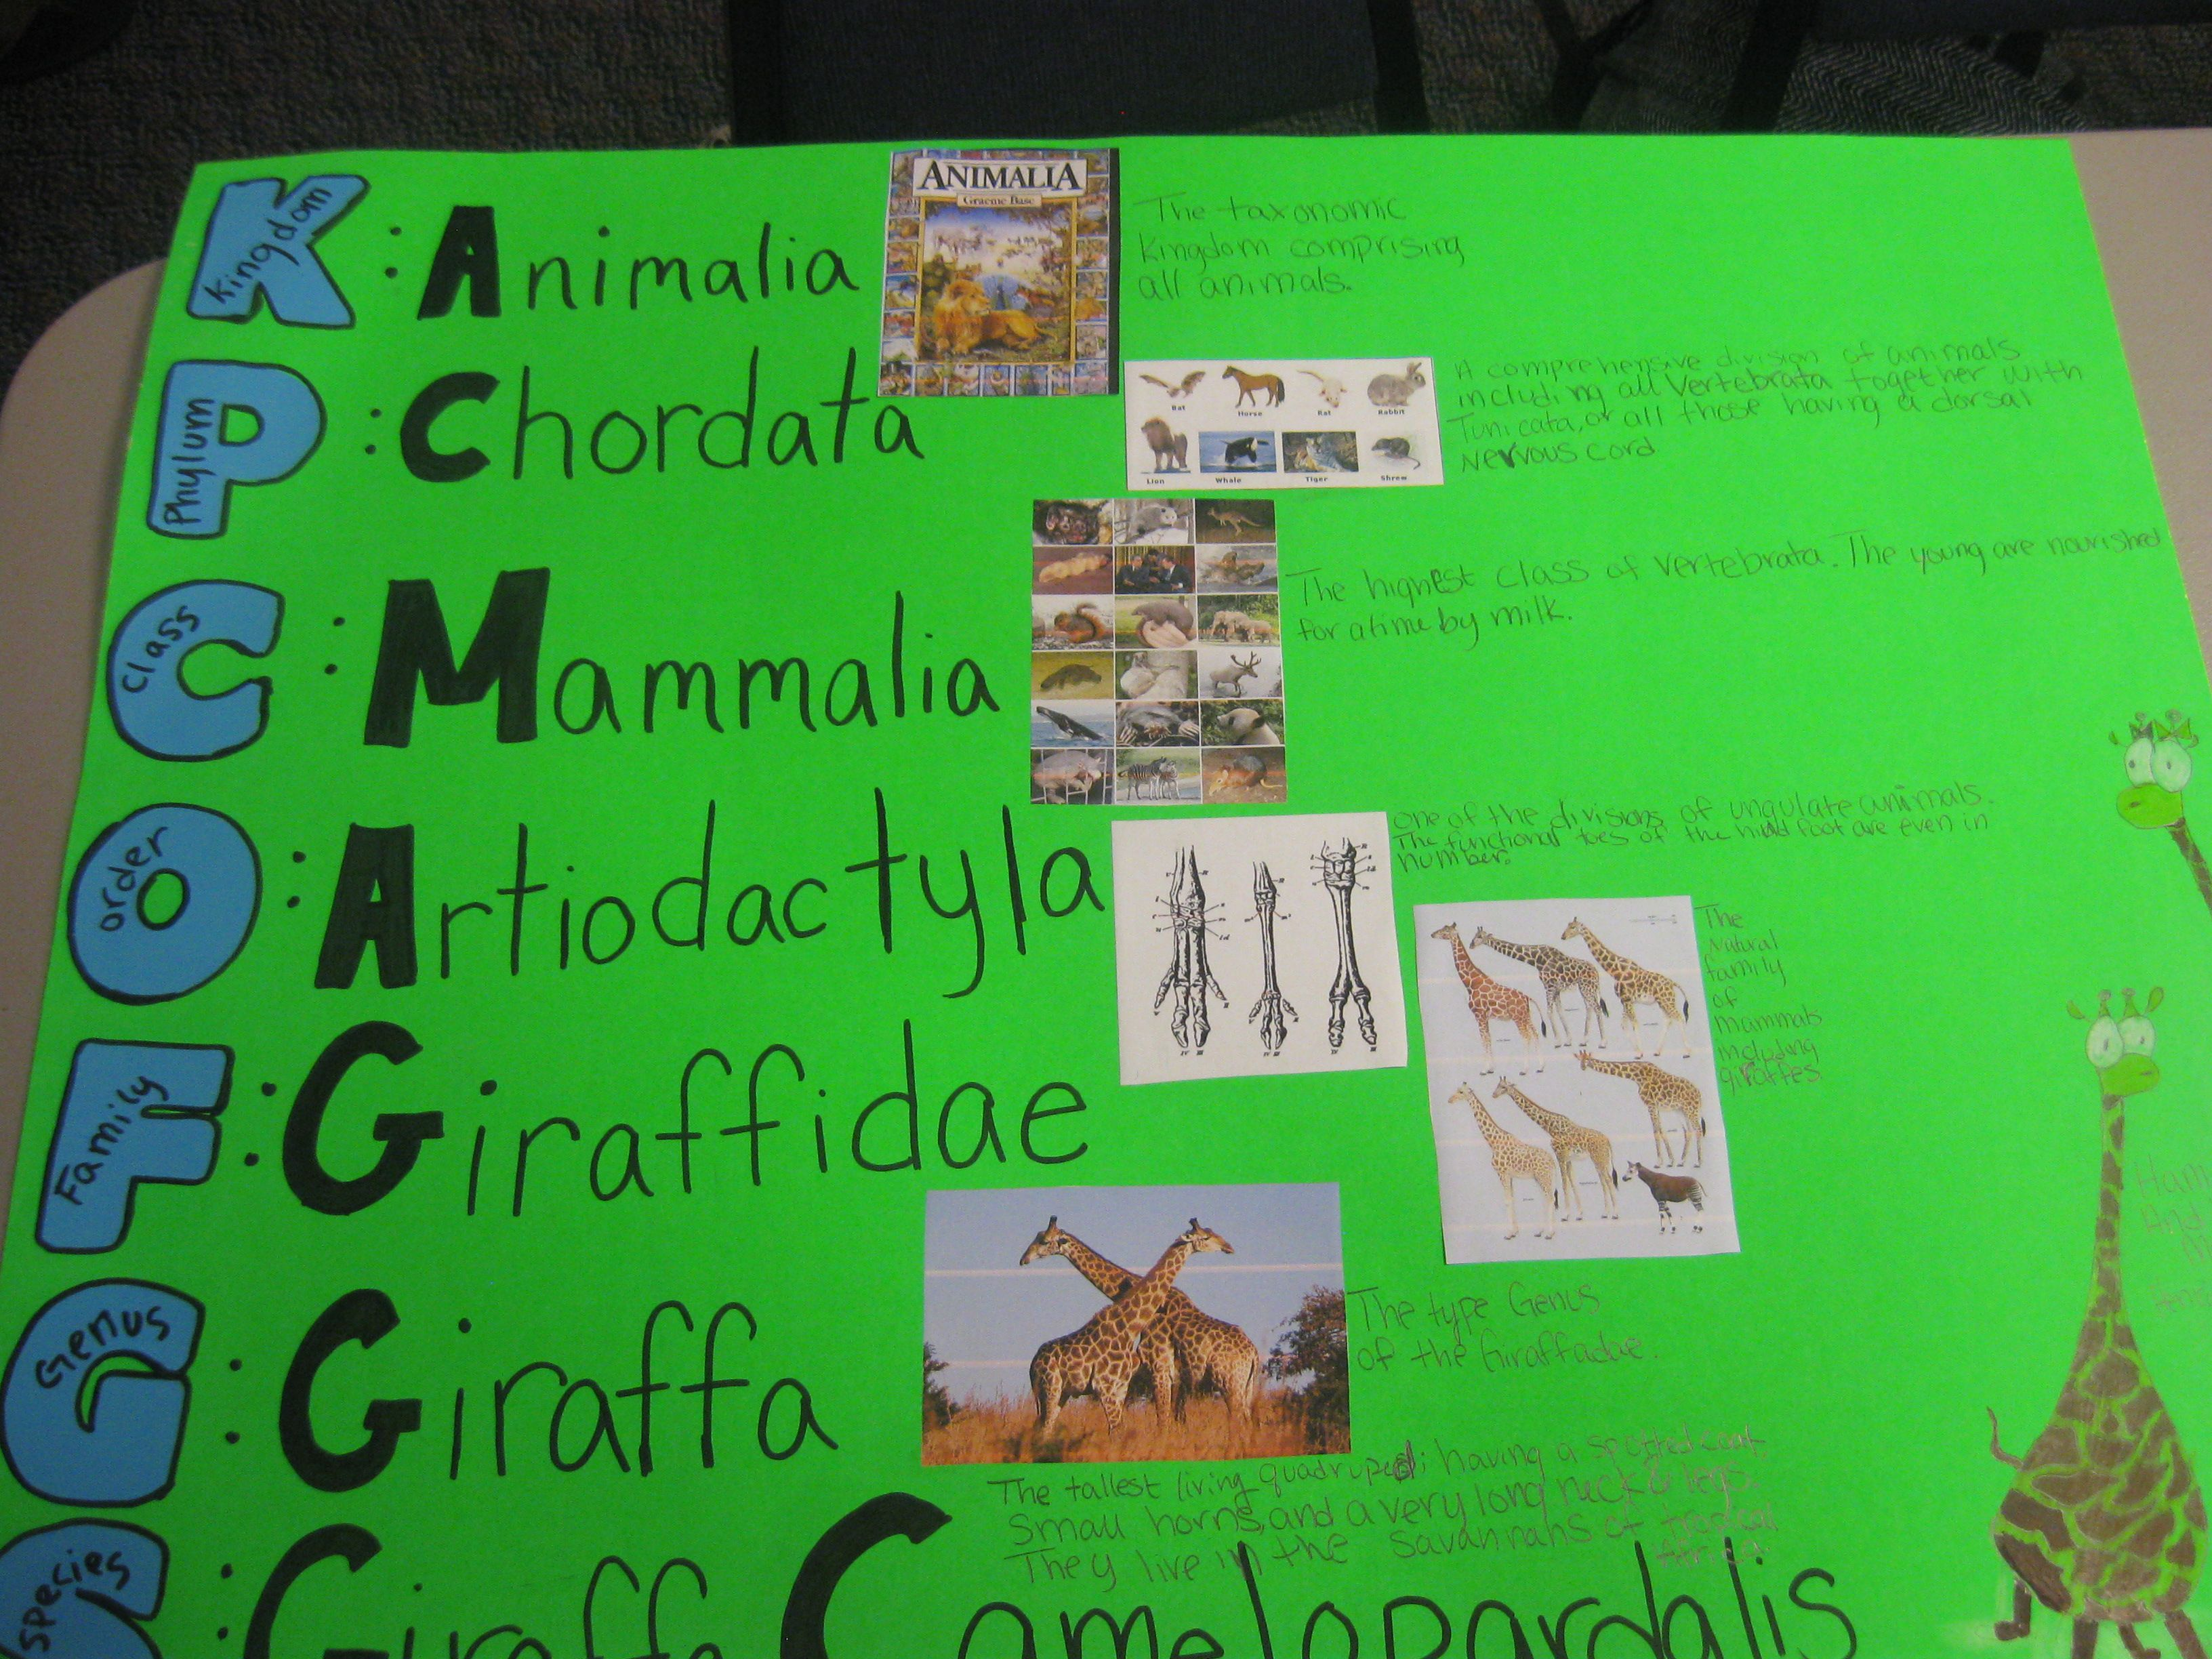 Discover Ideas About Animal Classification Pinterestcom